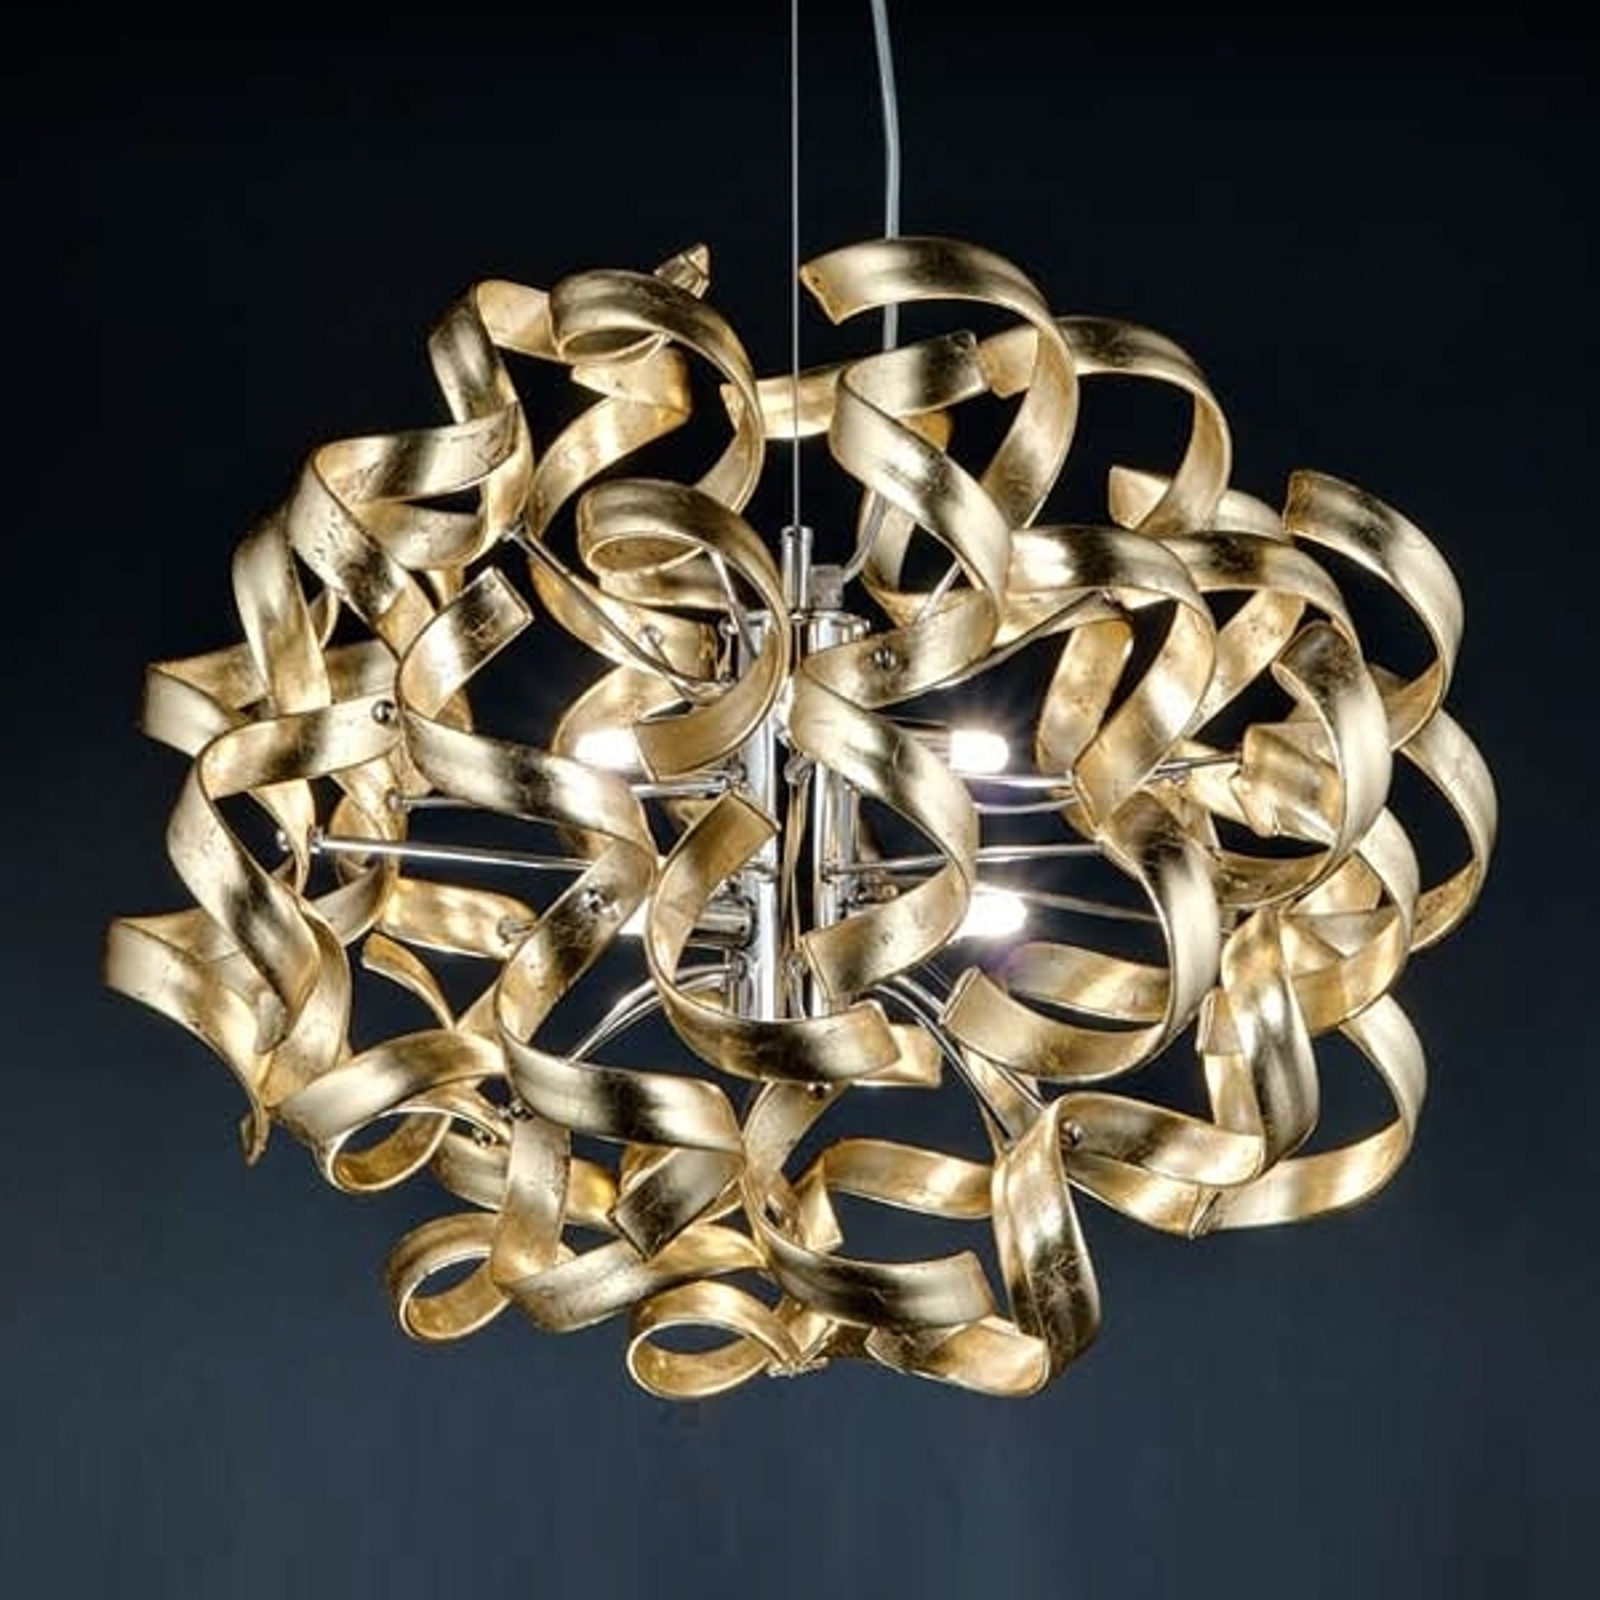 Mooie hanglamp Gold